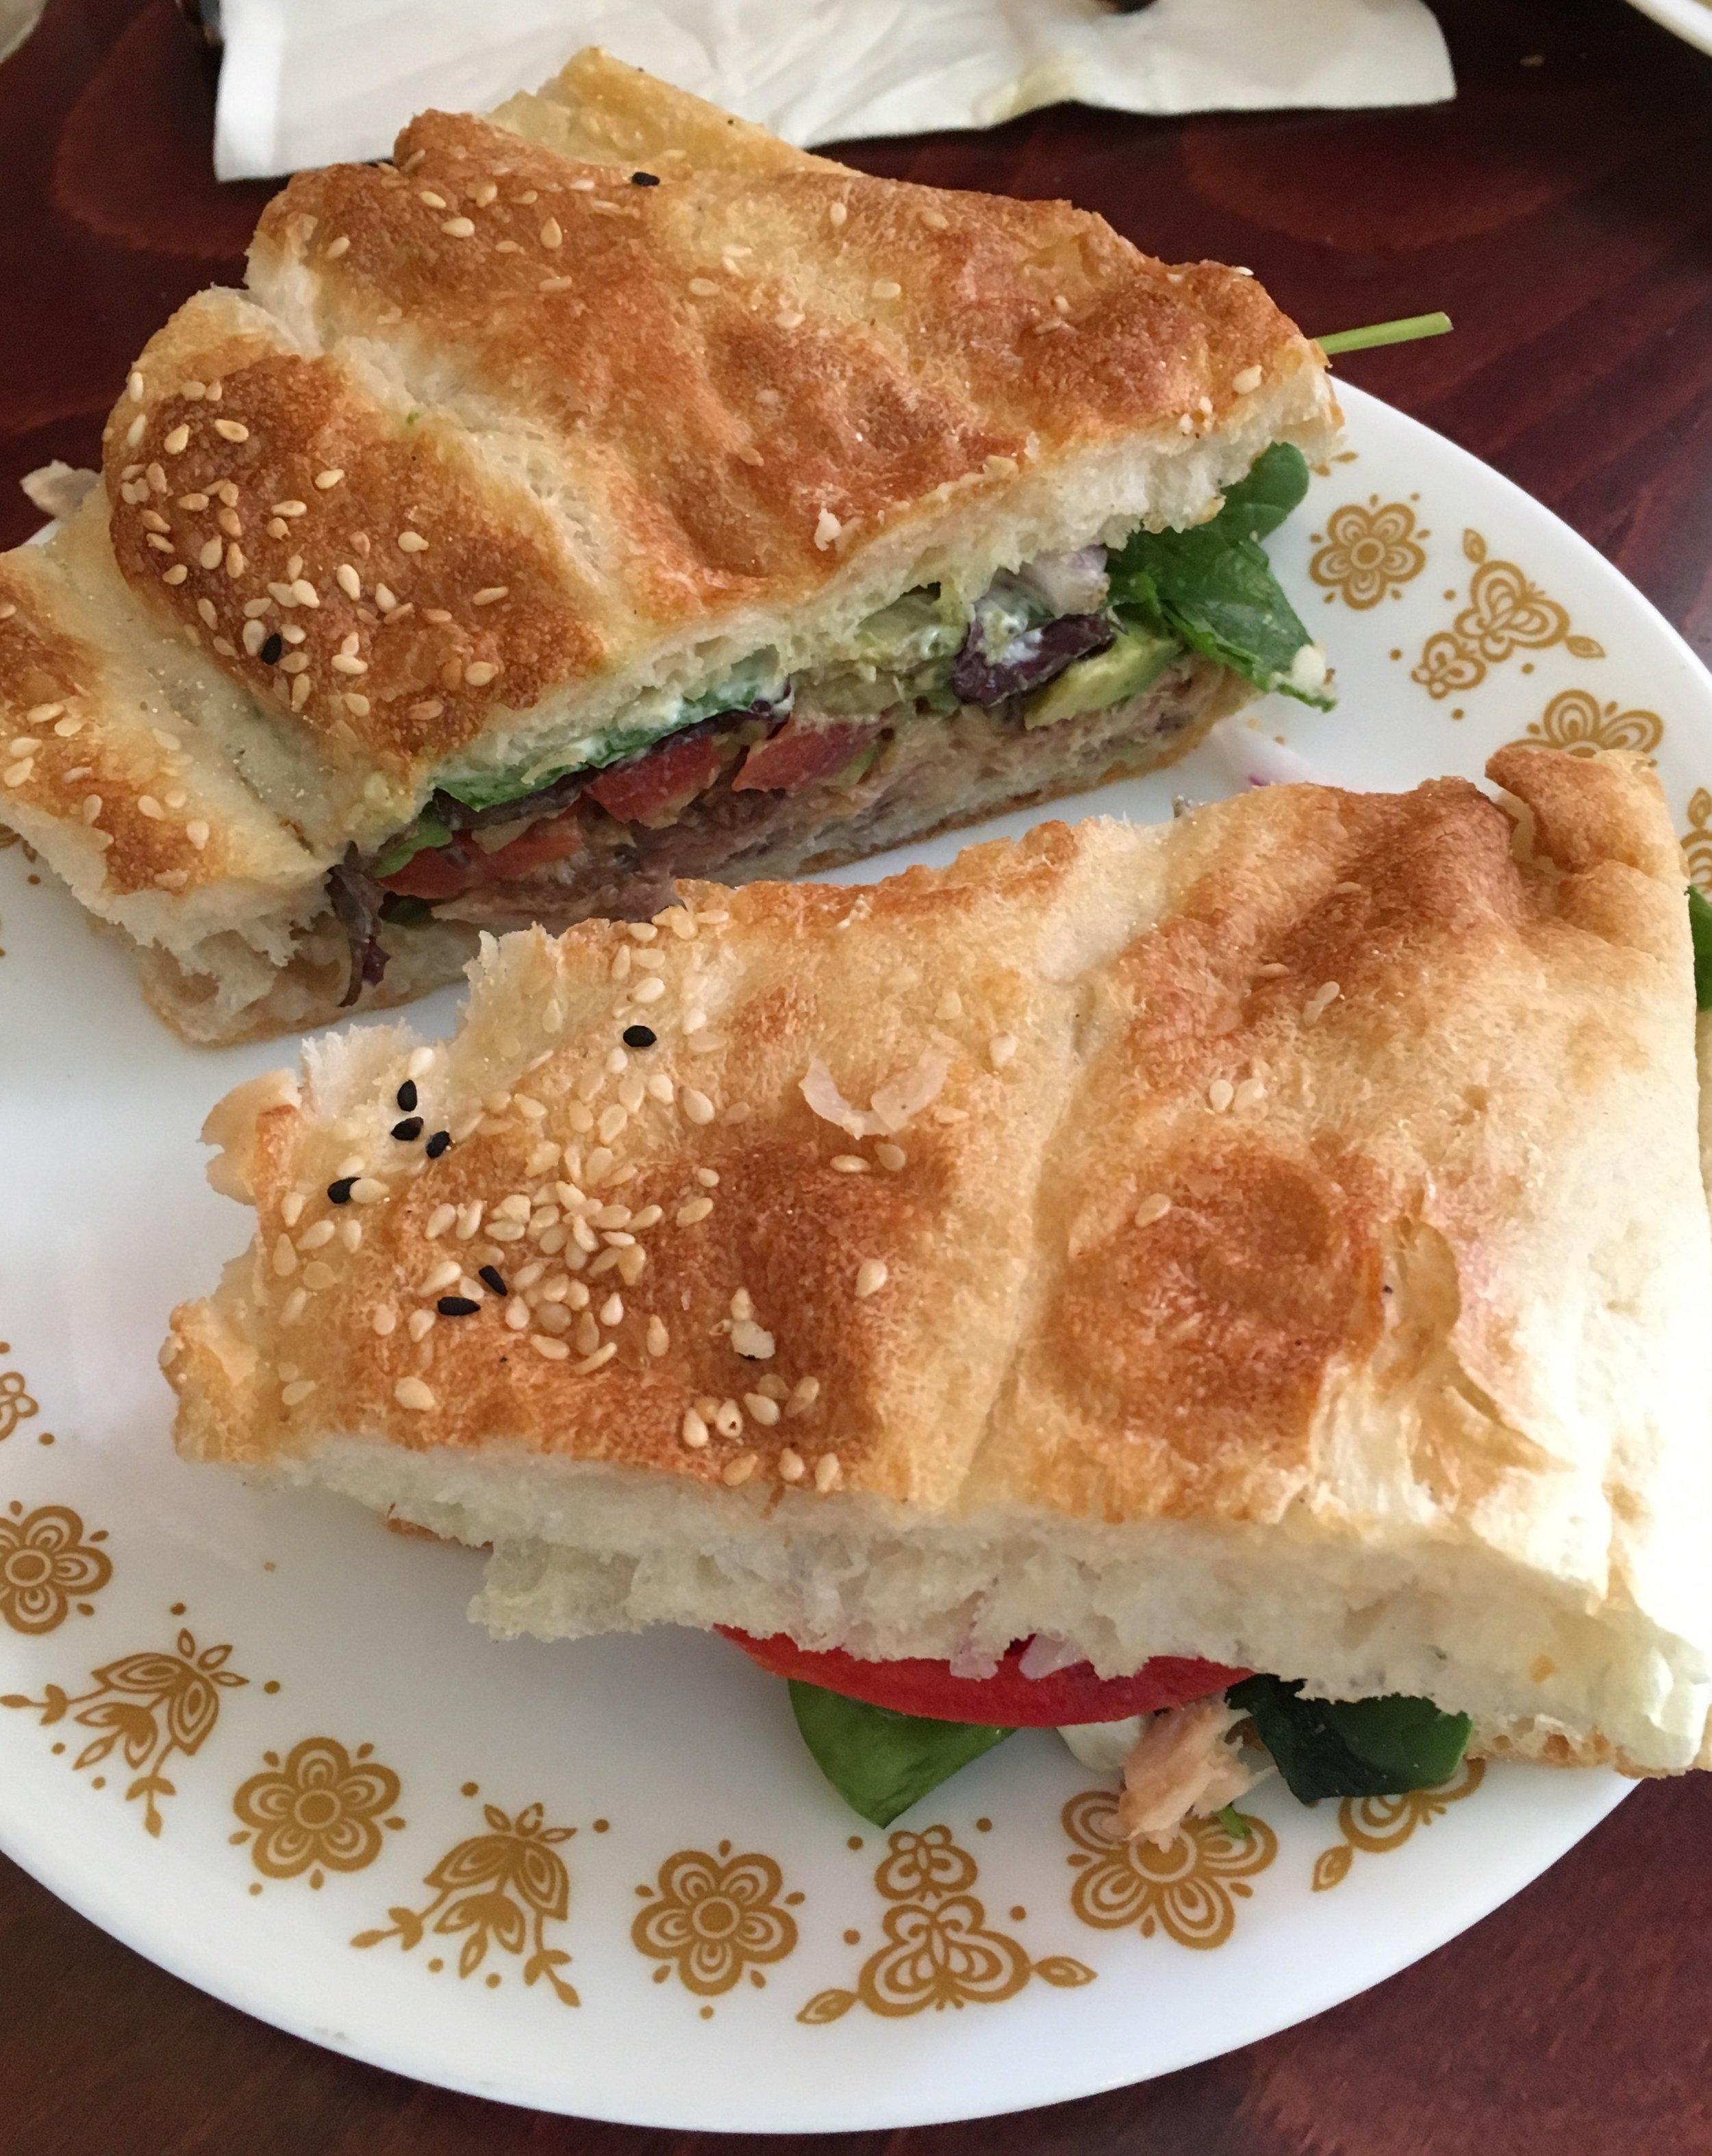 Omega-3 sardine sandwich @ The Big Cheese